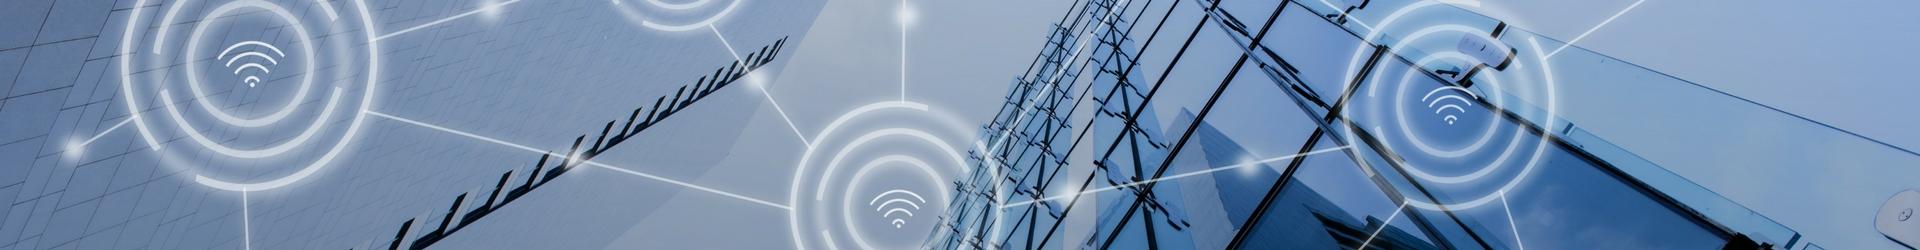 China Telecom Aims to make Shanghai Gigabit city